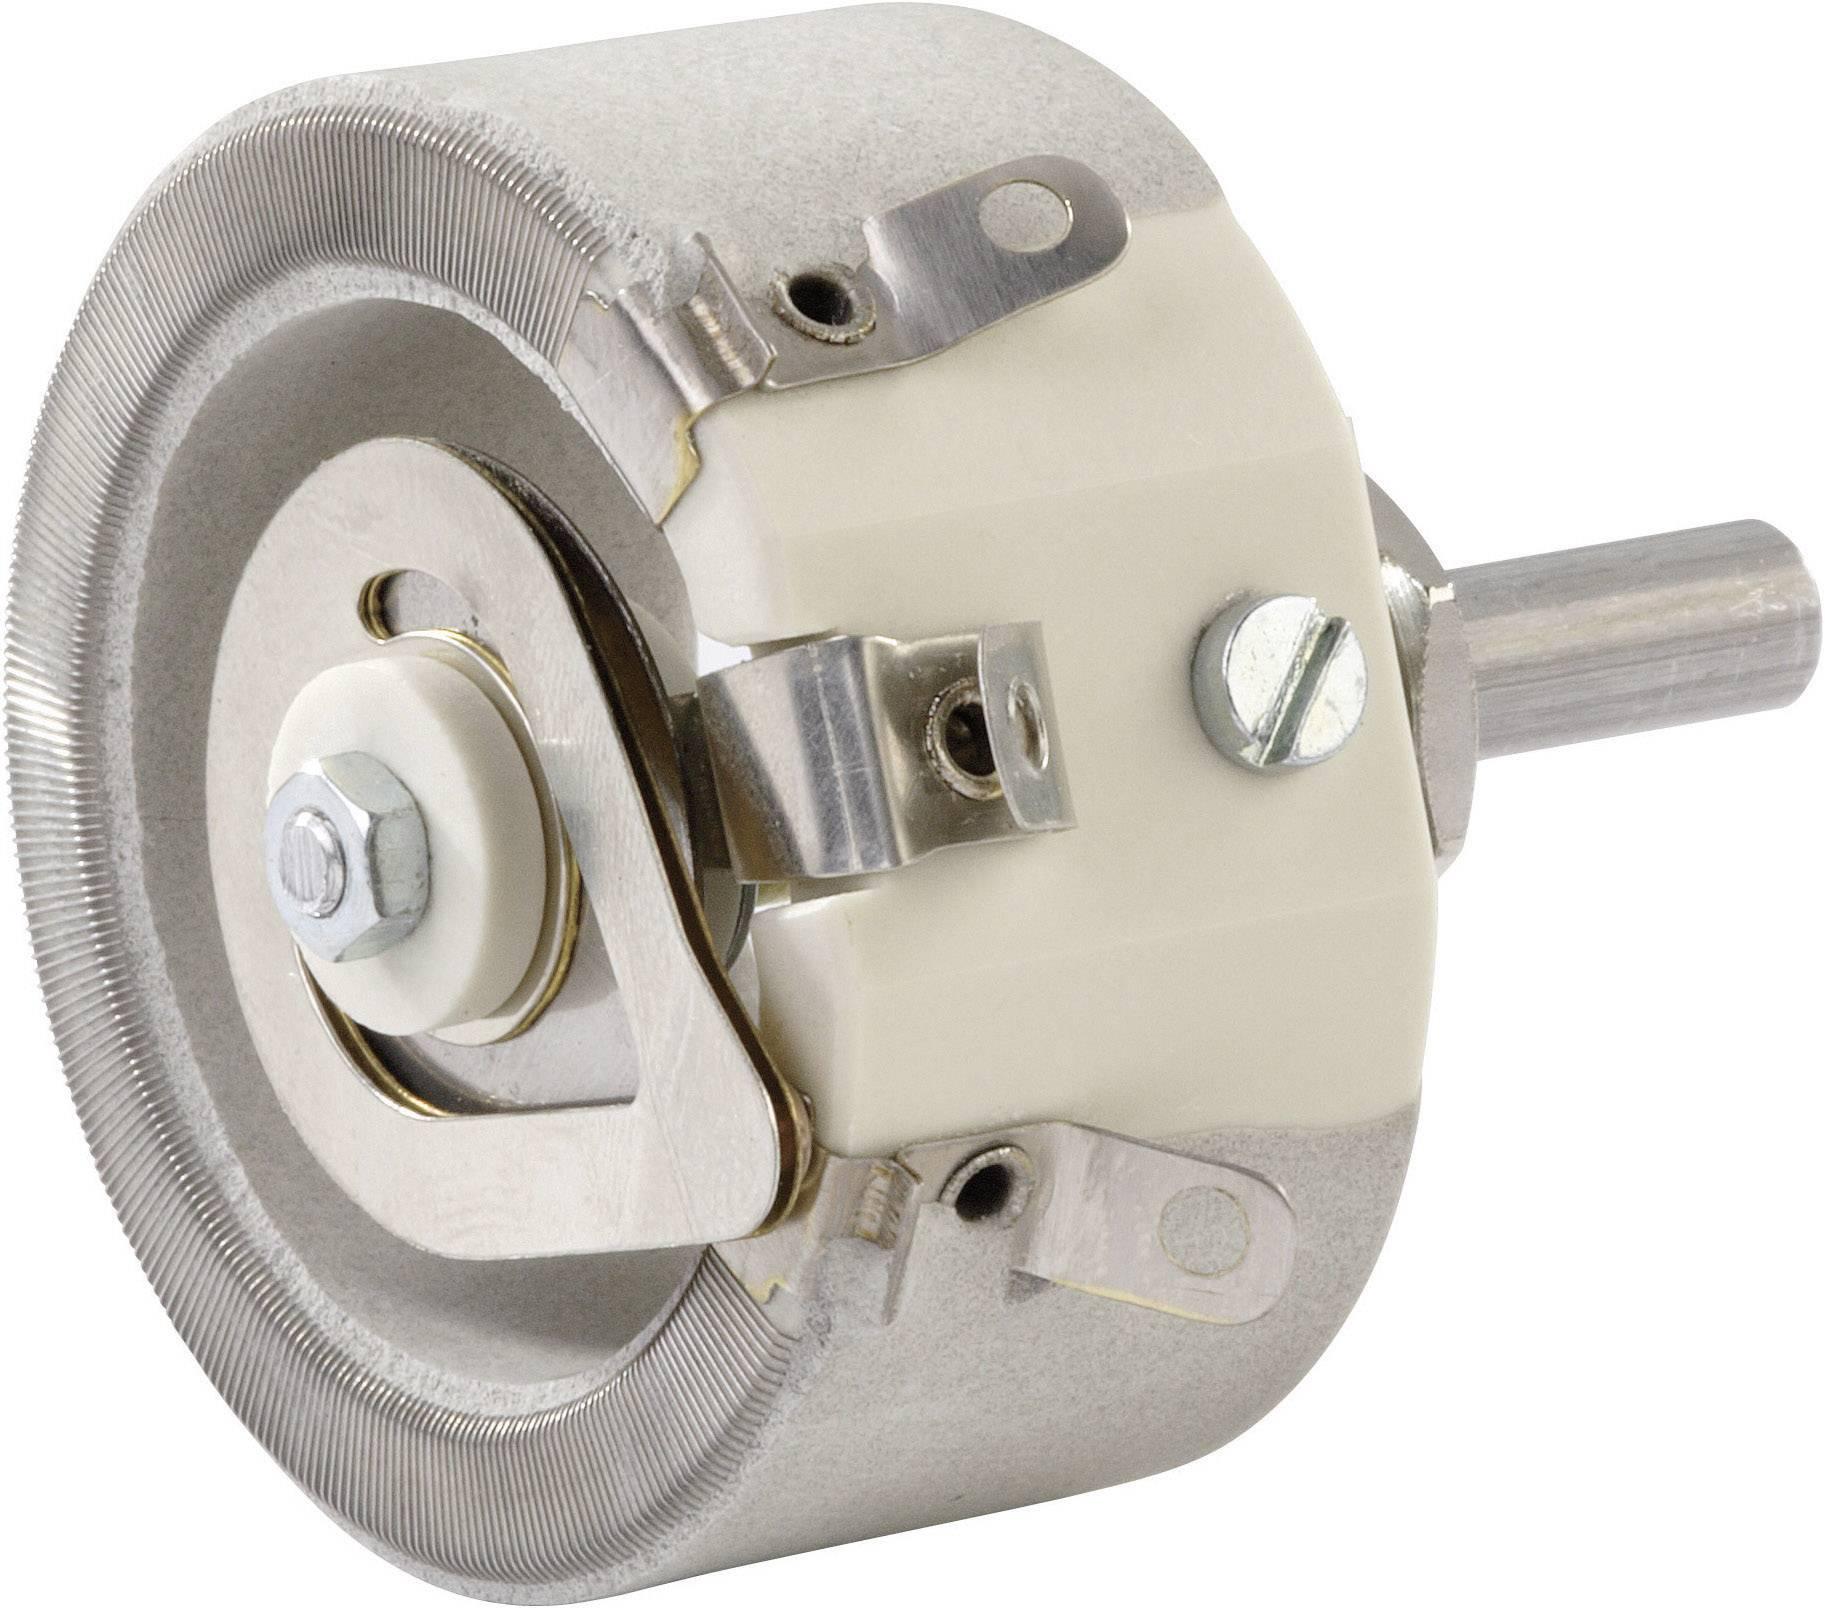 Drôtový potenciometer mono TT Electronics AB 3191004700 3191004700, 10 W, 220 Ohm, 1 ks